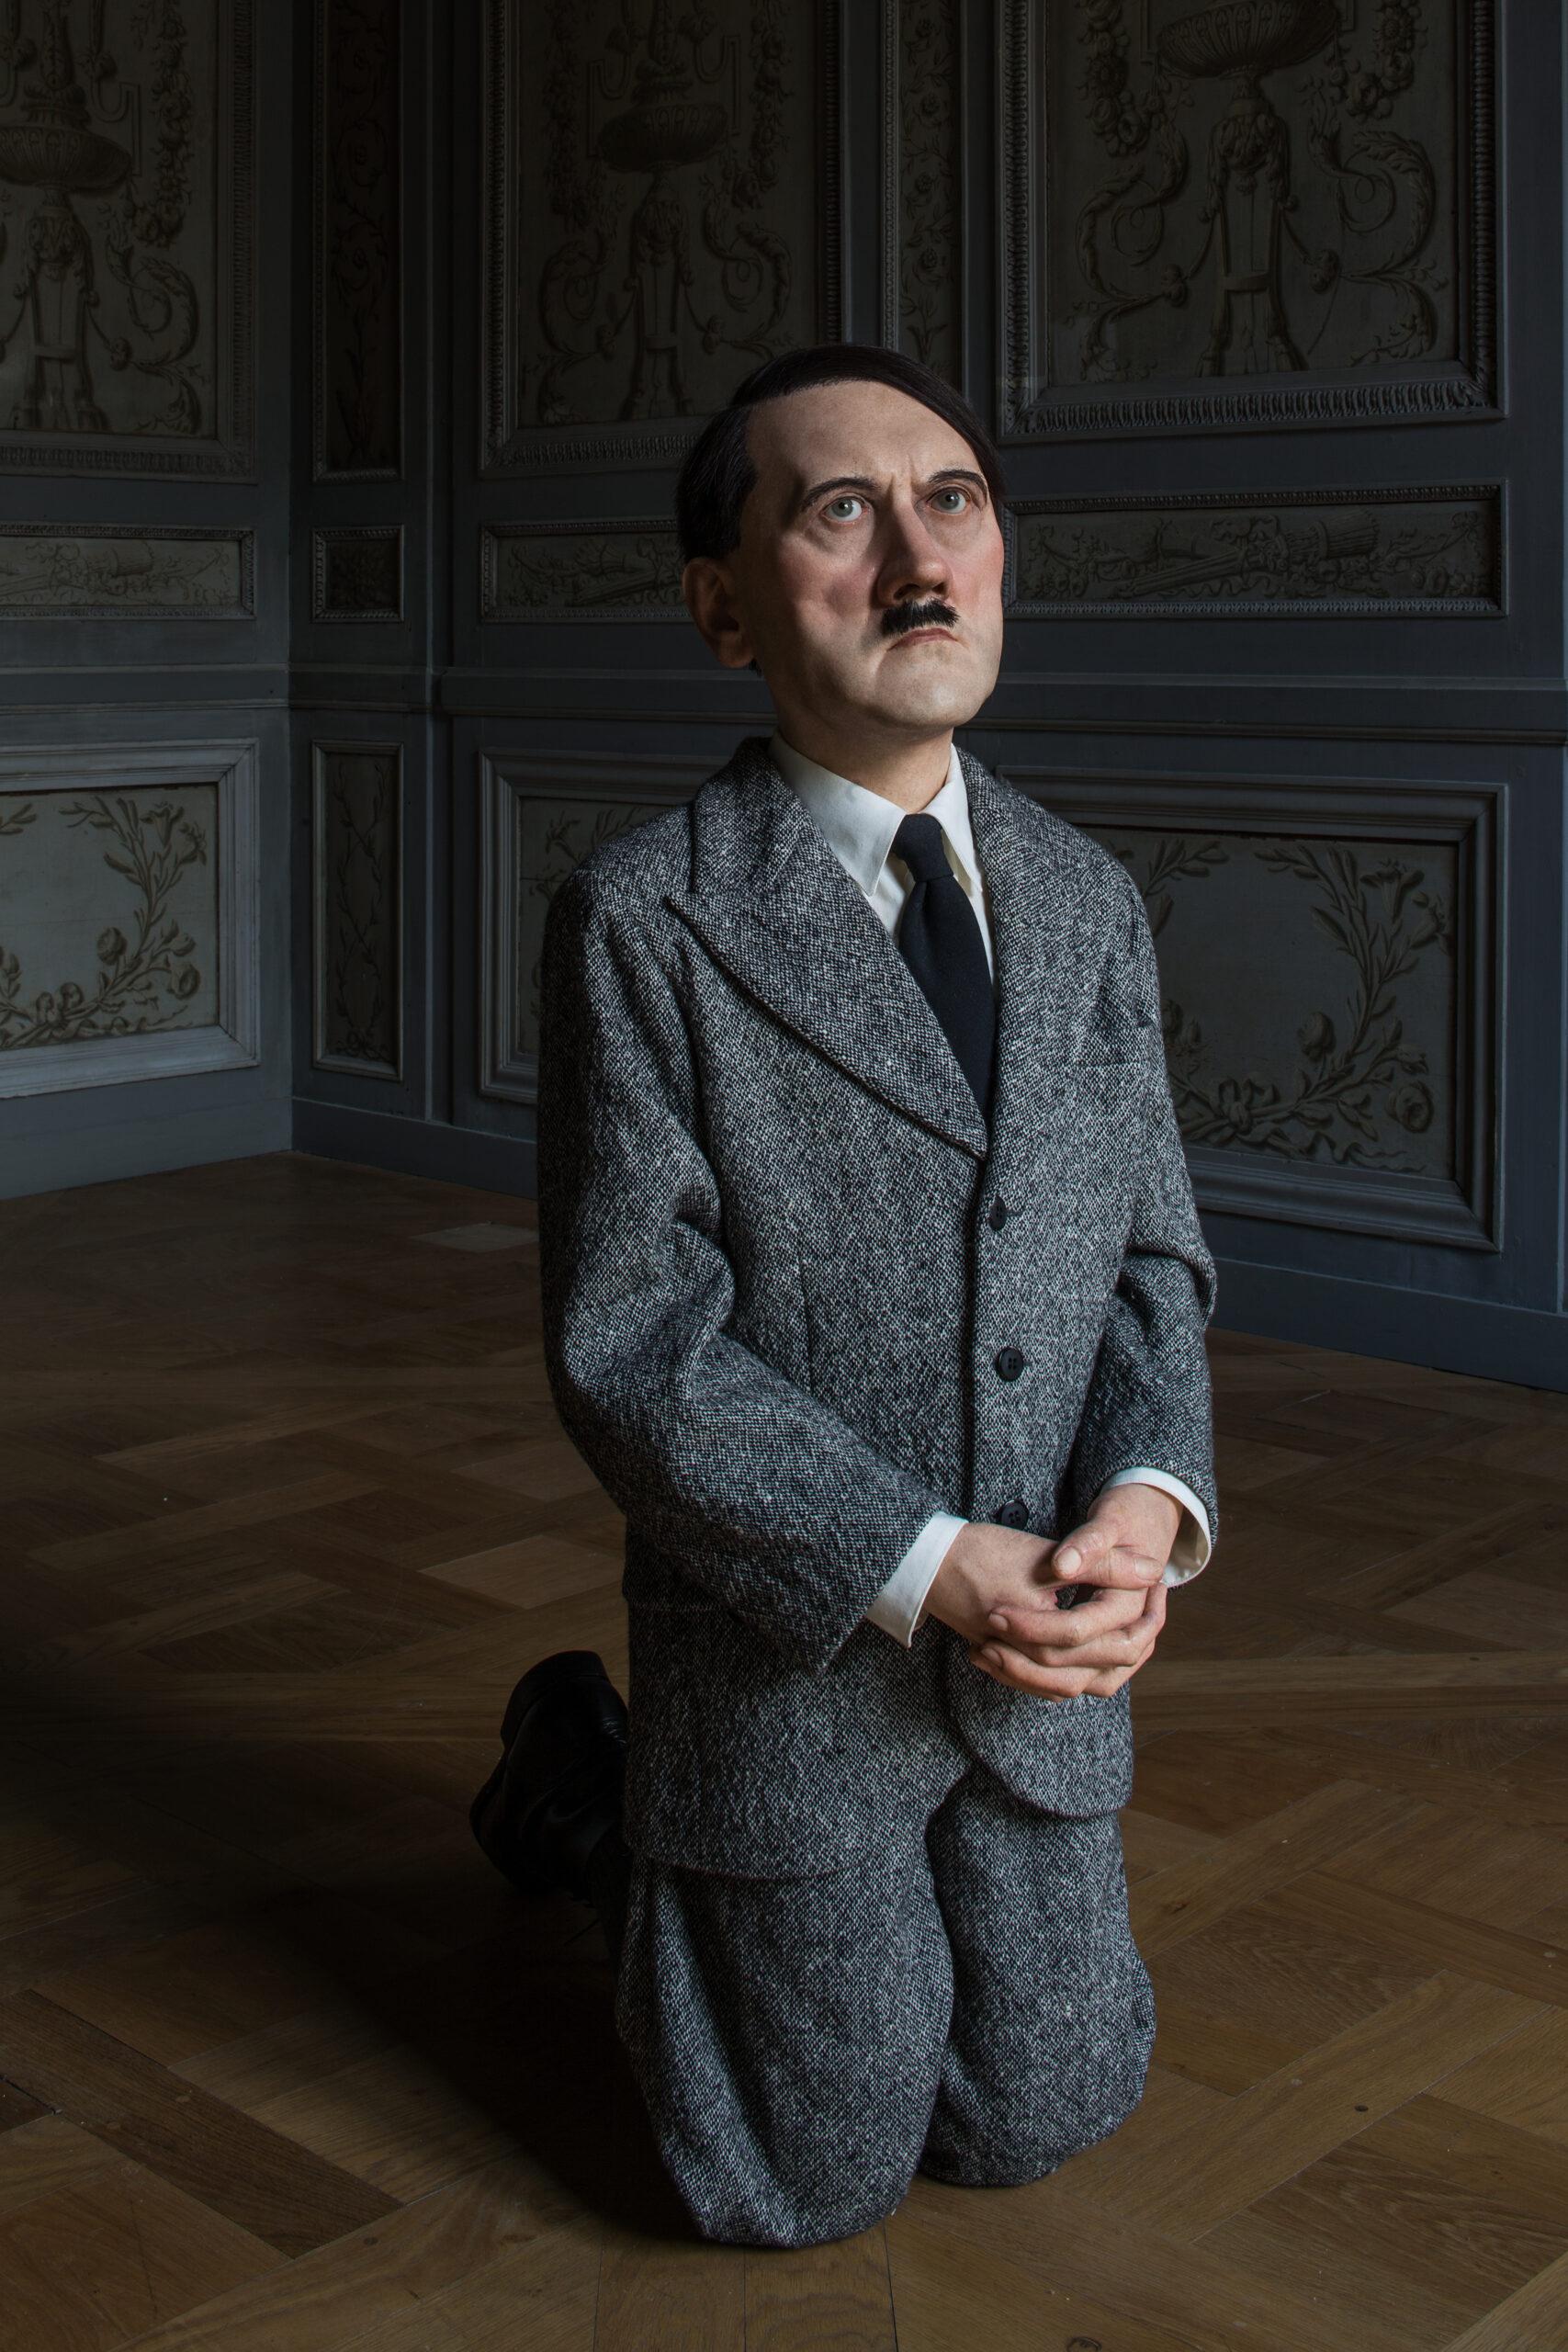 Maurizio Cattelan, Him, 2001, Wax, human hair, suit, and polyester resin, 101 x 41 x 53 cm  Installation view, Monnaie de Paris, 2016. Courtesy Maurizio Cattelan's Archive  Photo Zeno Zotti